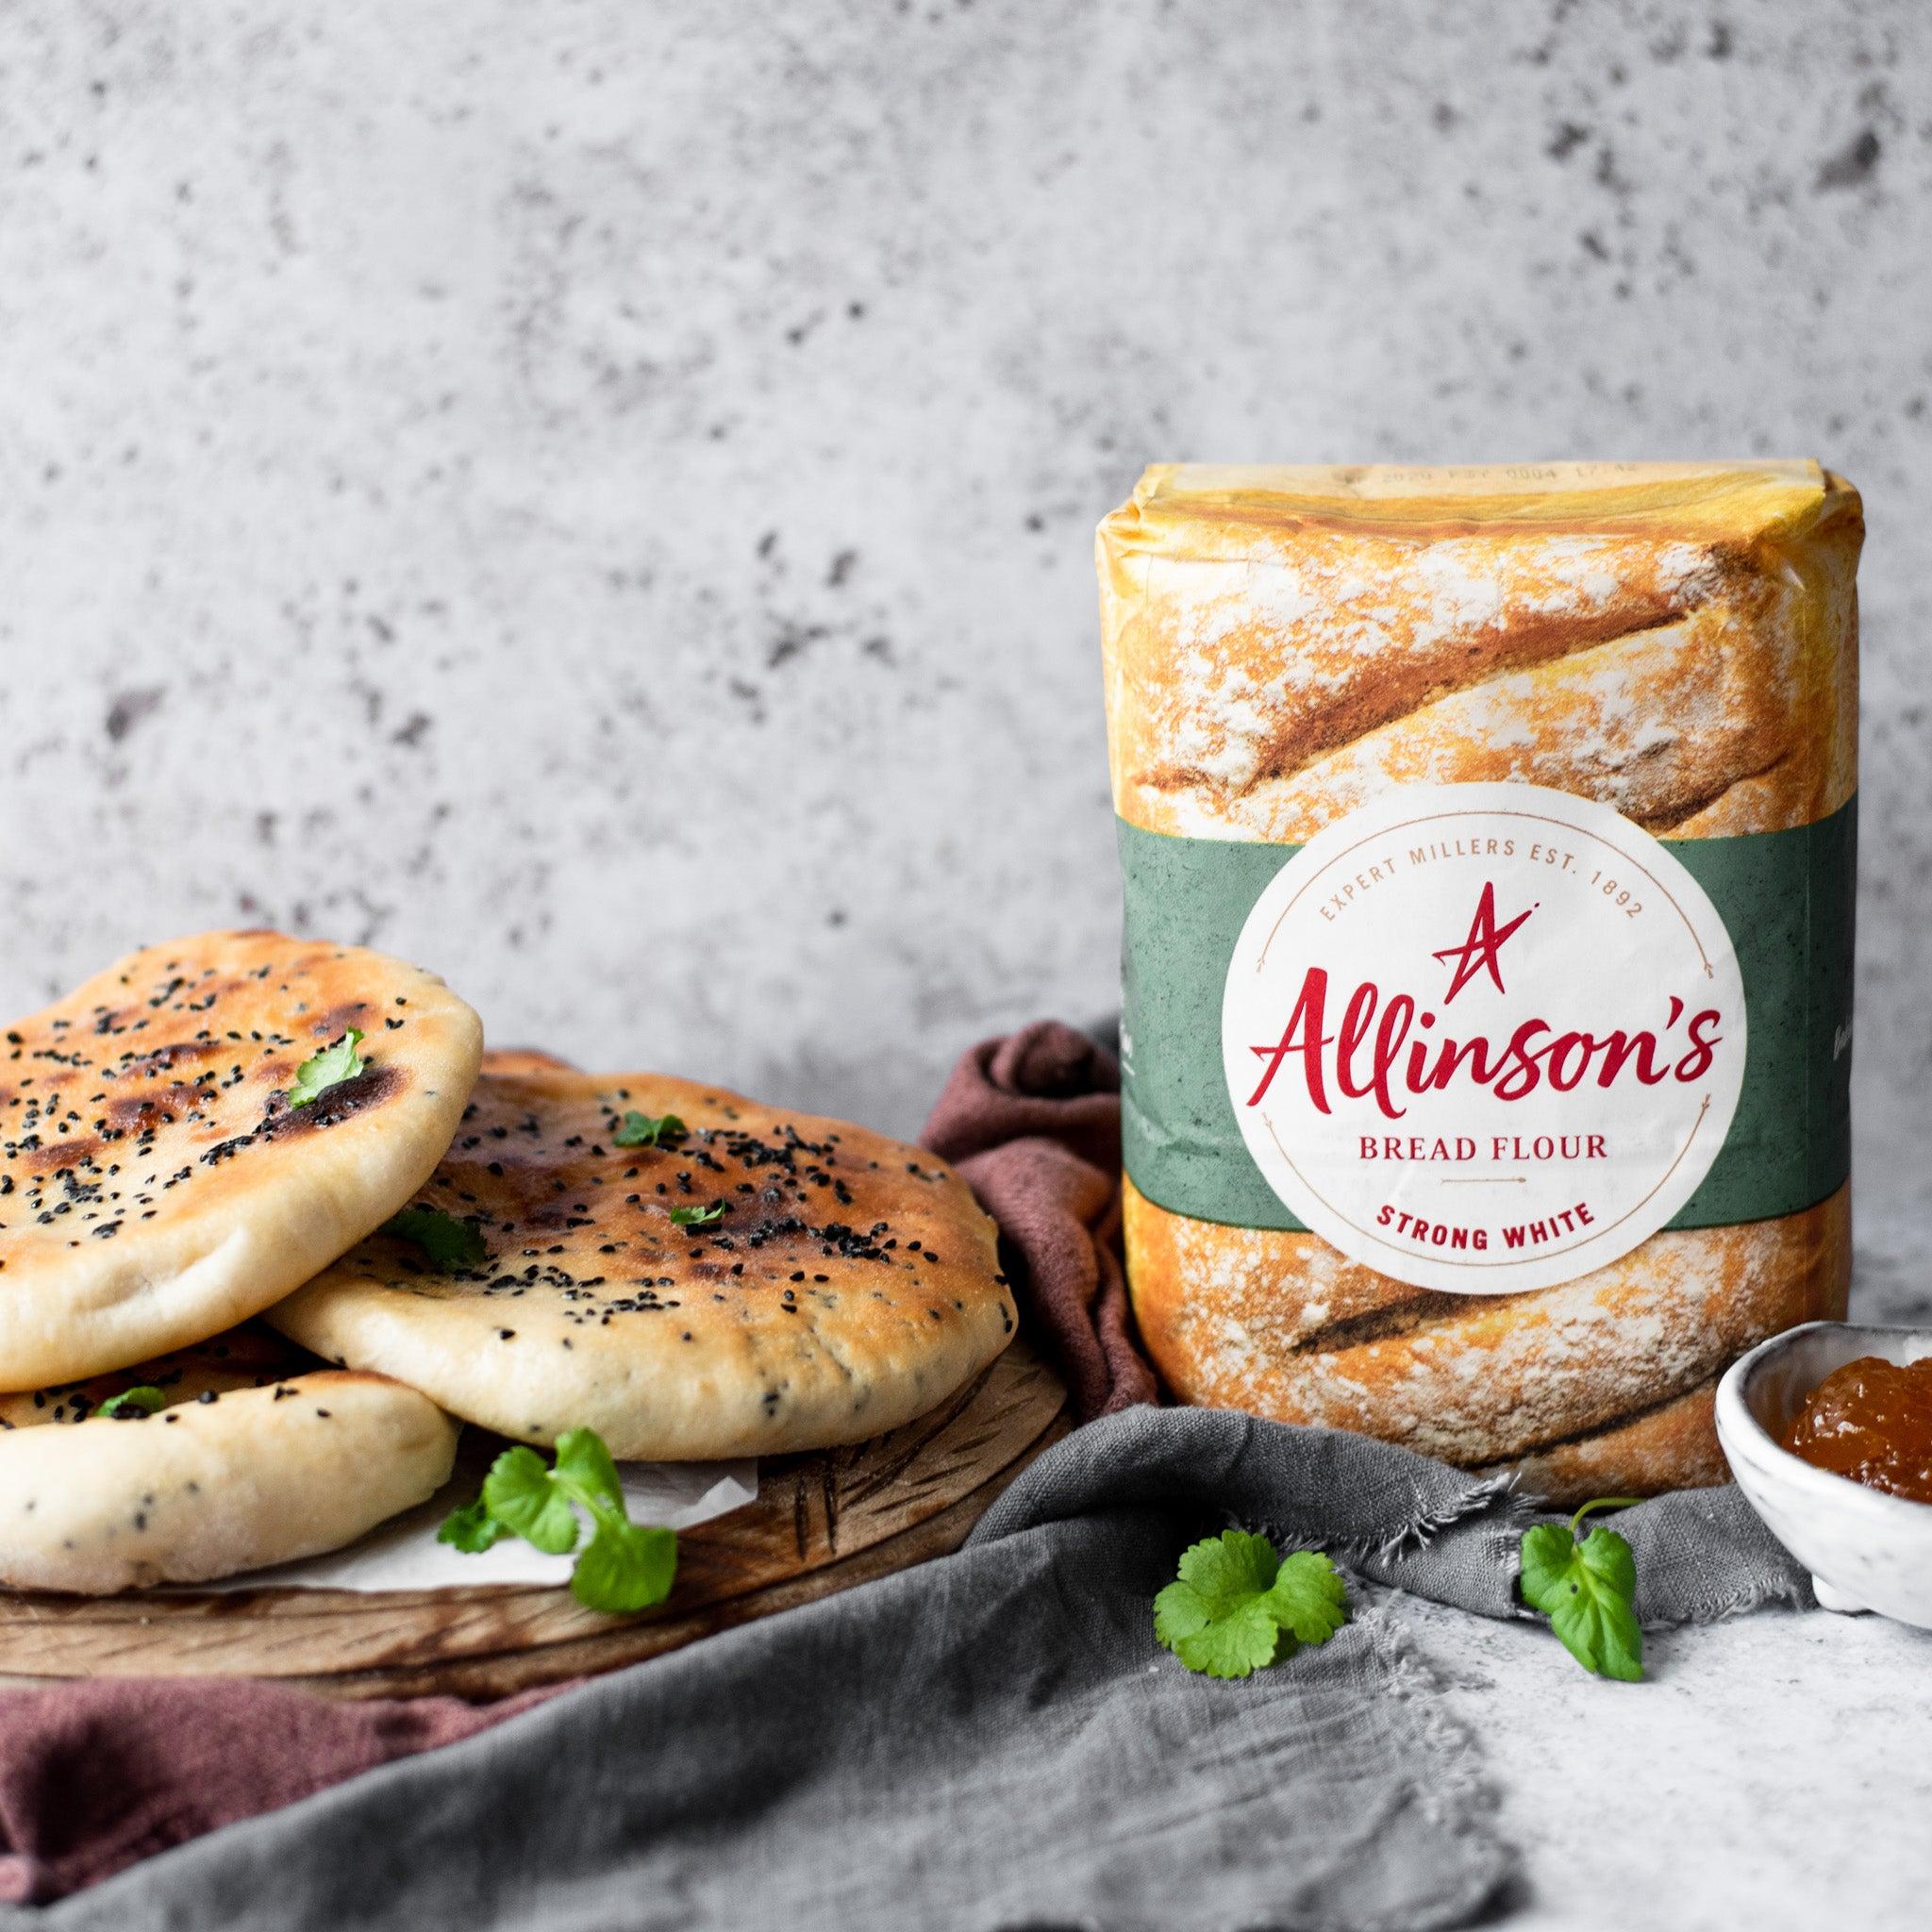 Allinsons-Naan-Bread-1-1-Baking-Mad-1.jpg